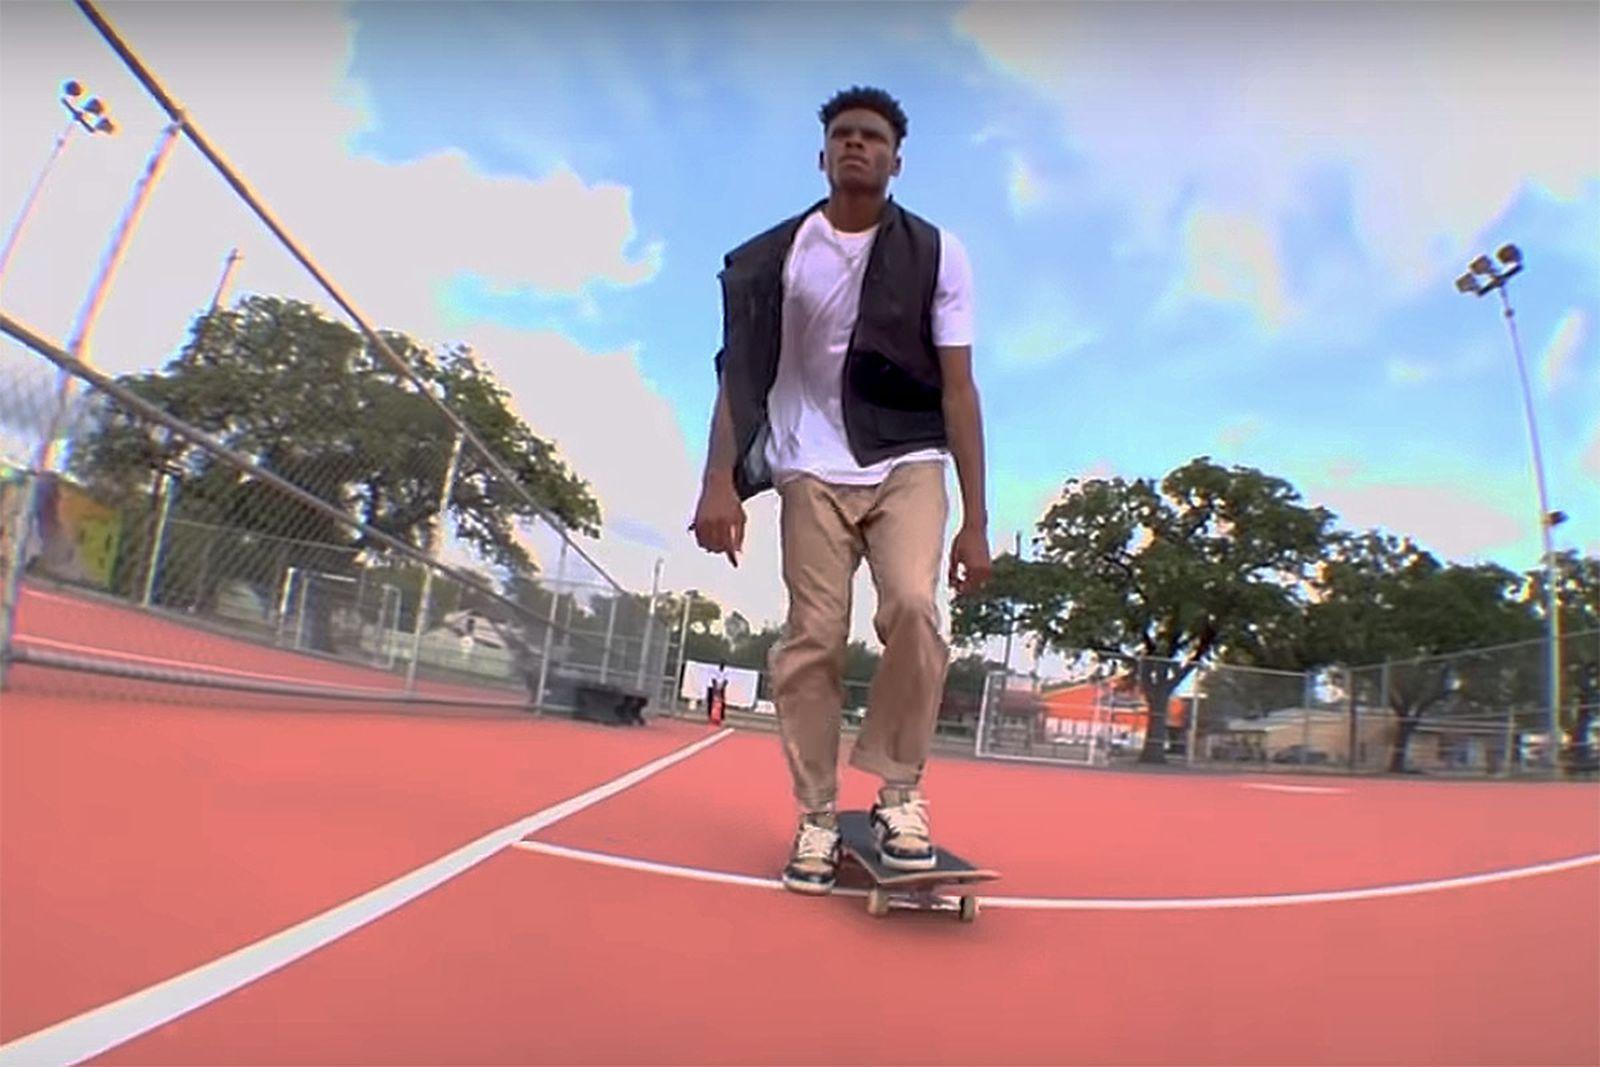 Nike Travis Scott skate vid